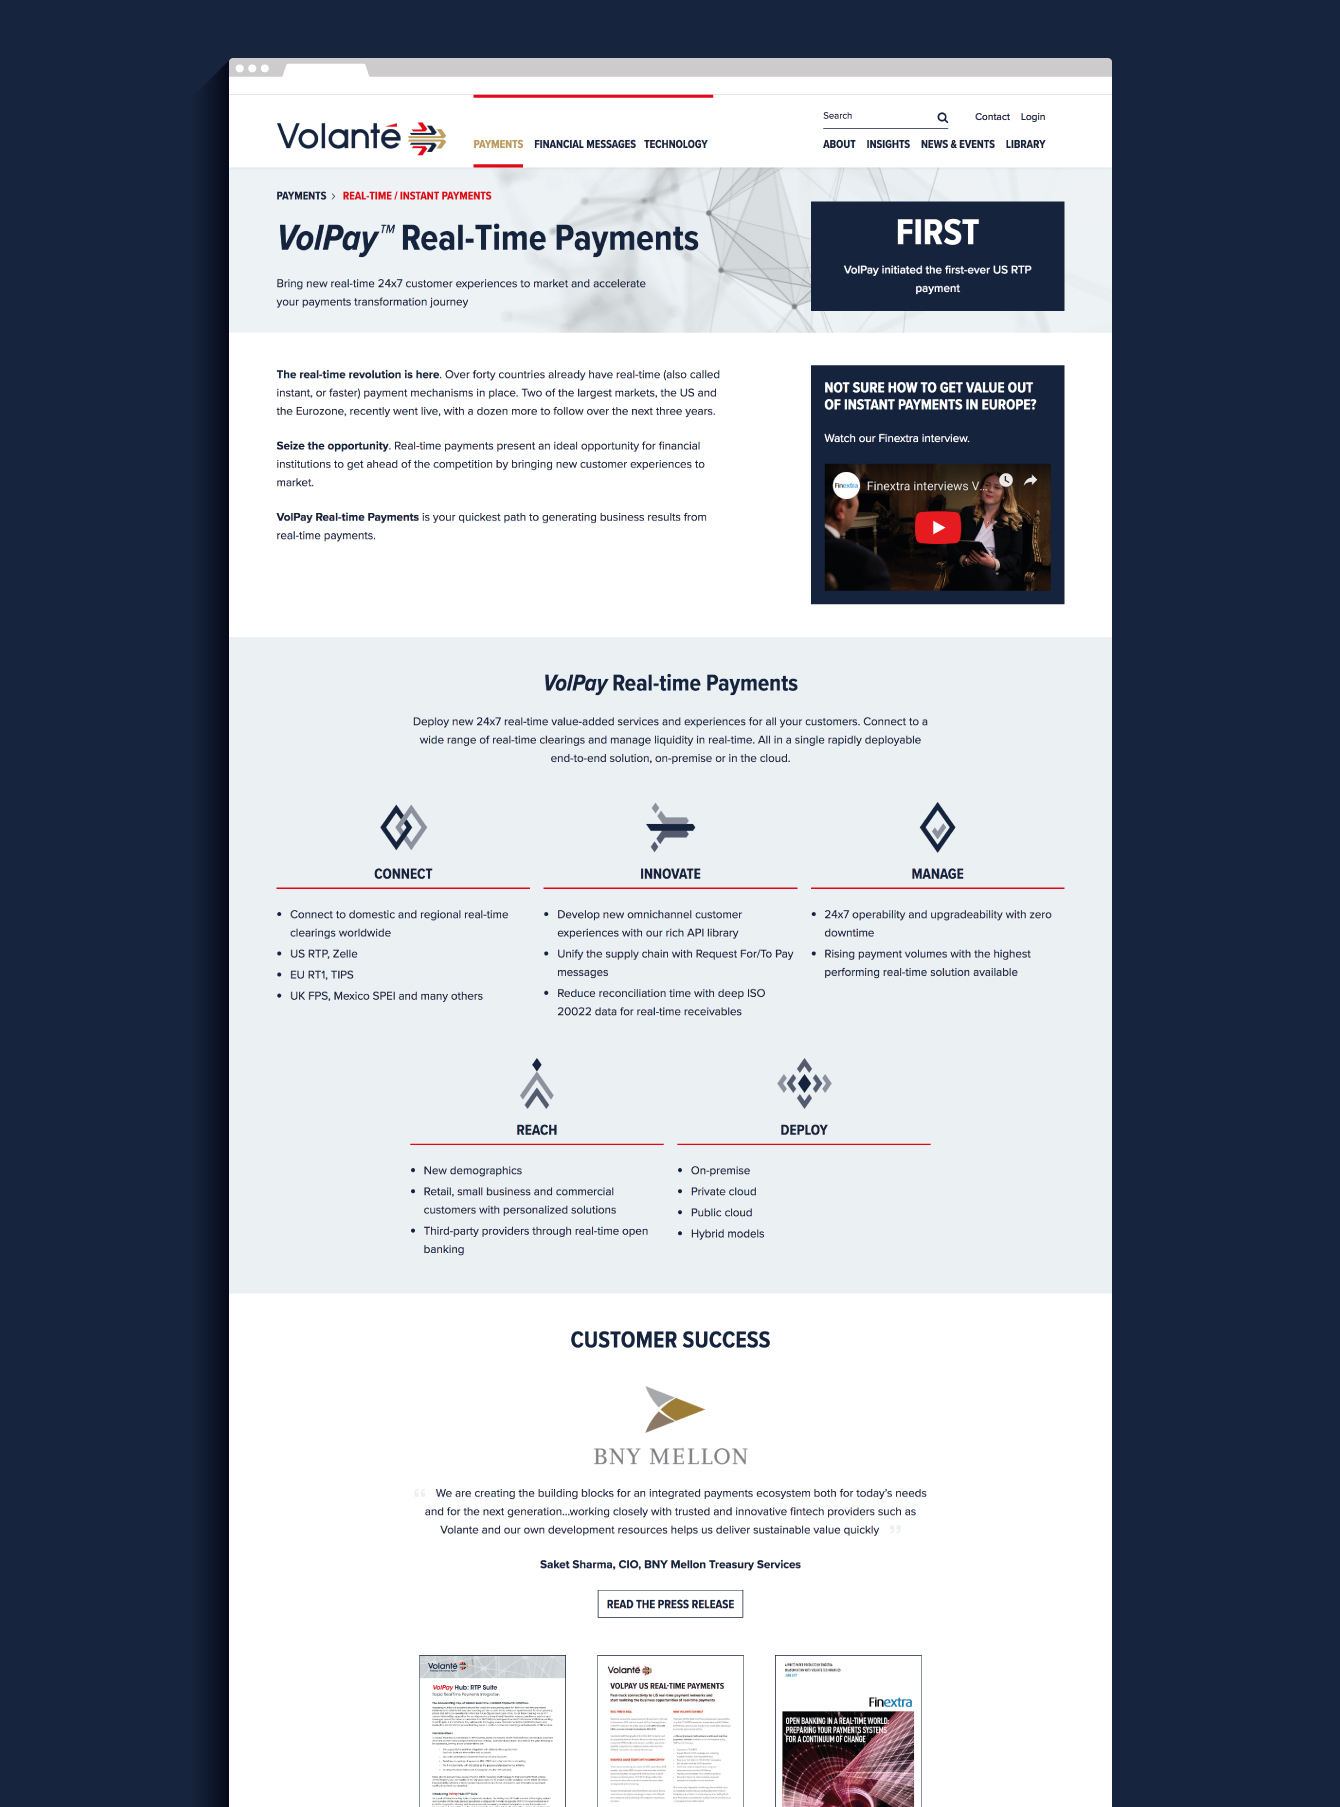 Volante website - desktop